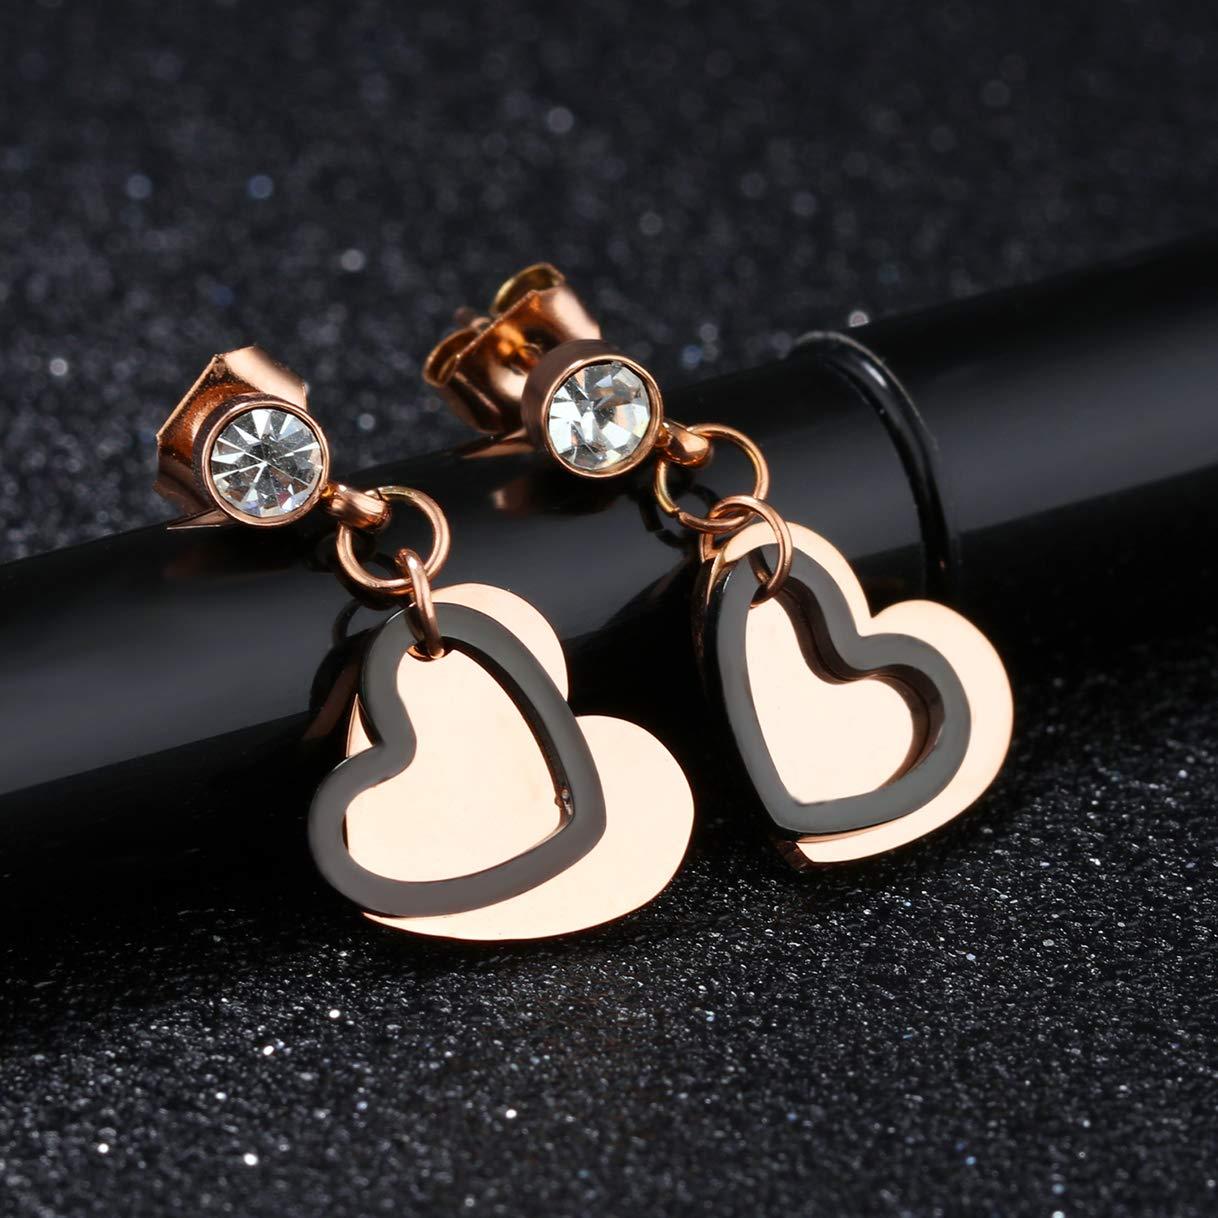 CHARMFAME Black Love Heart Drop Earrings Rose Gold Plated Stainless Steel CZ Dangle Earrings for Women /& Girls